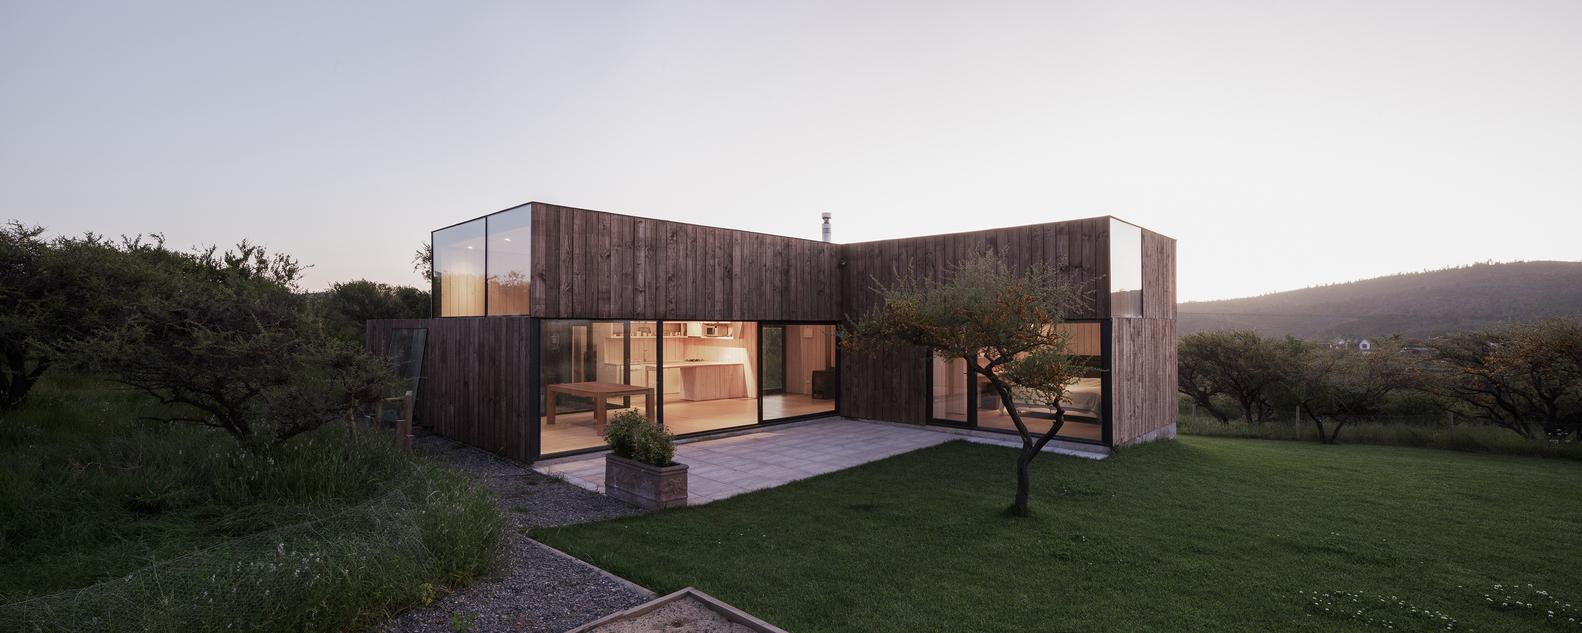 CML House / Ricardo Torrejon & Arturo Chadwick (16)